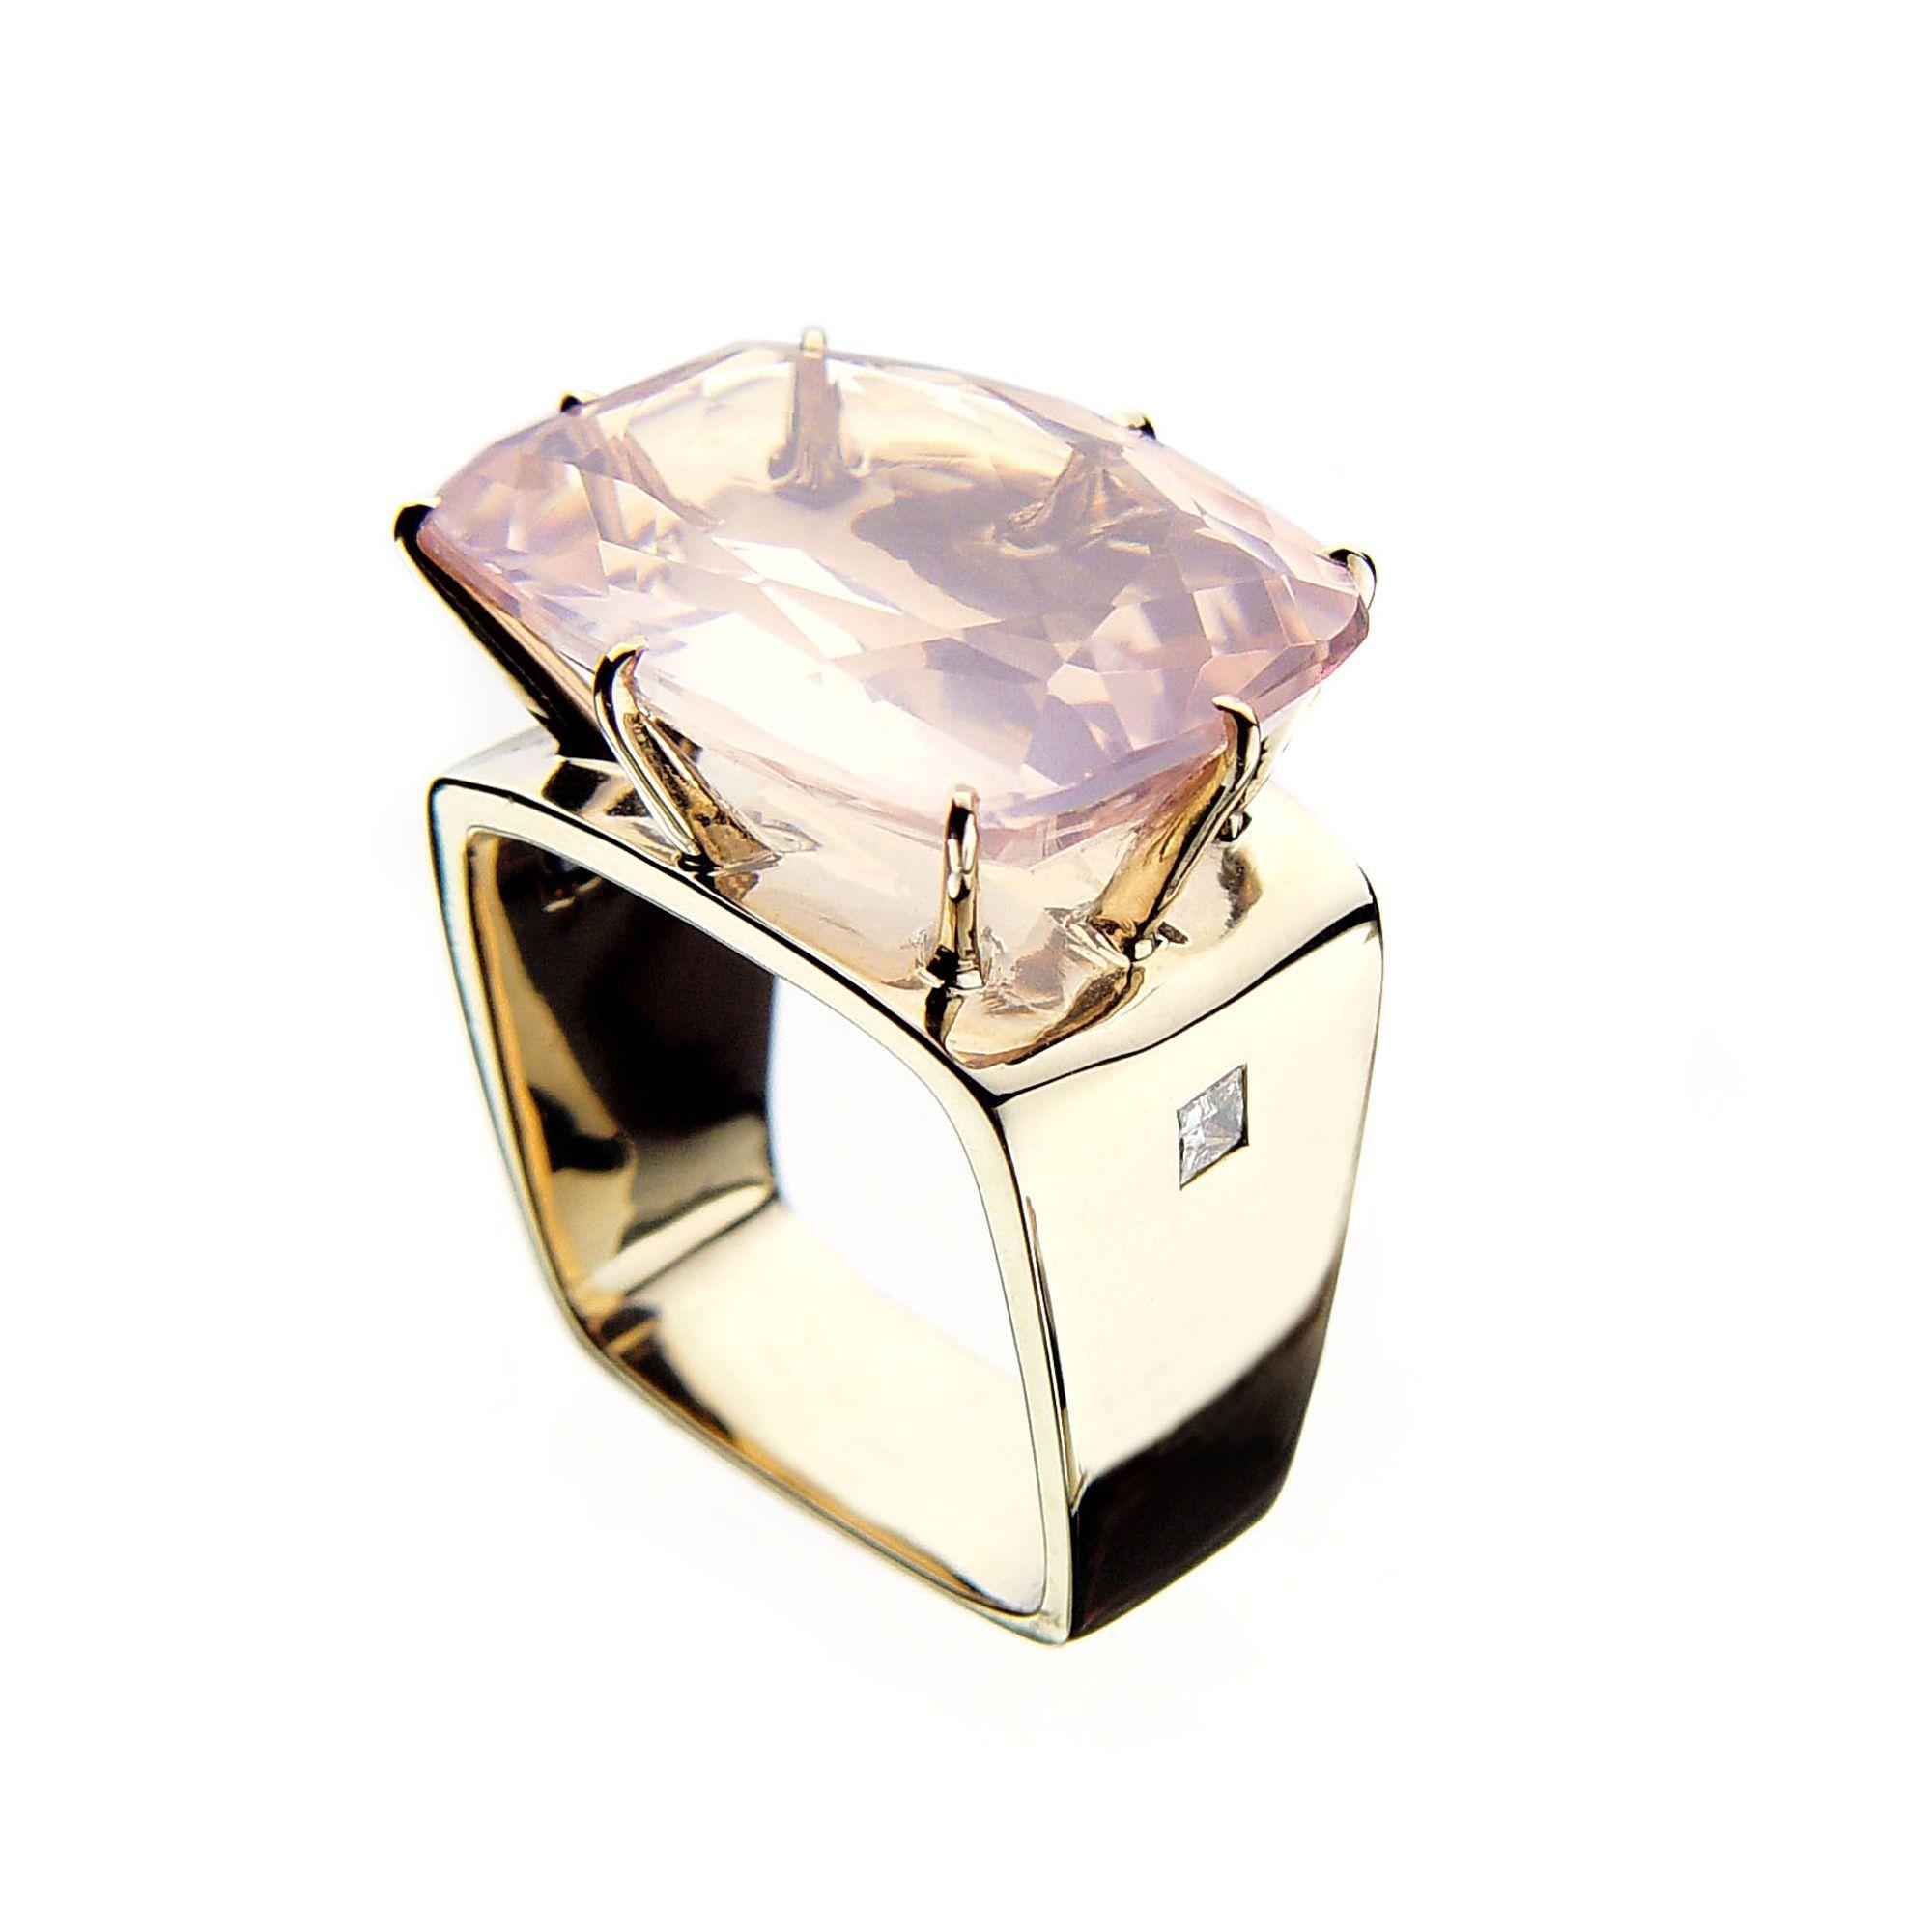 H stern sunrise ring anillo de amatista variedad transparente